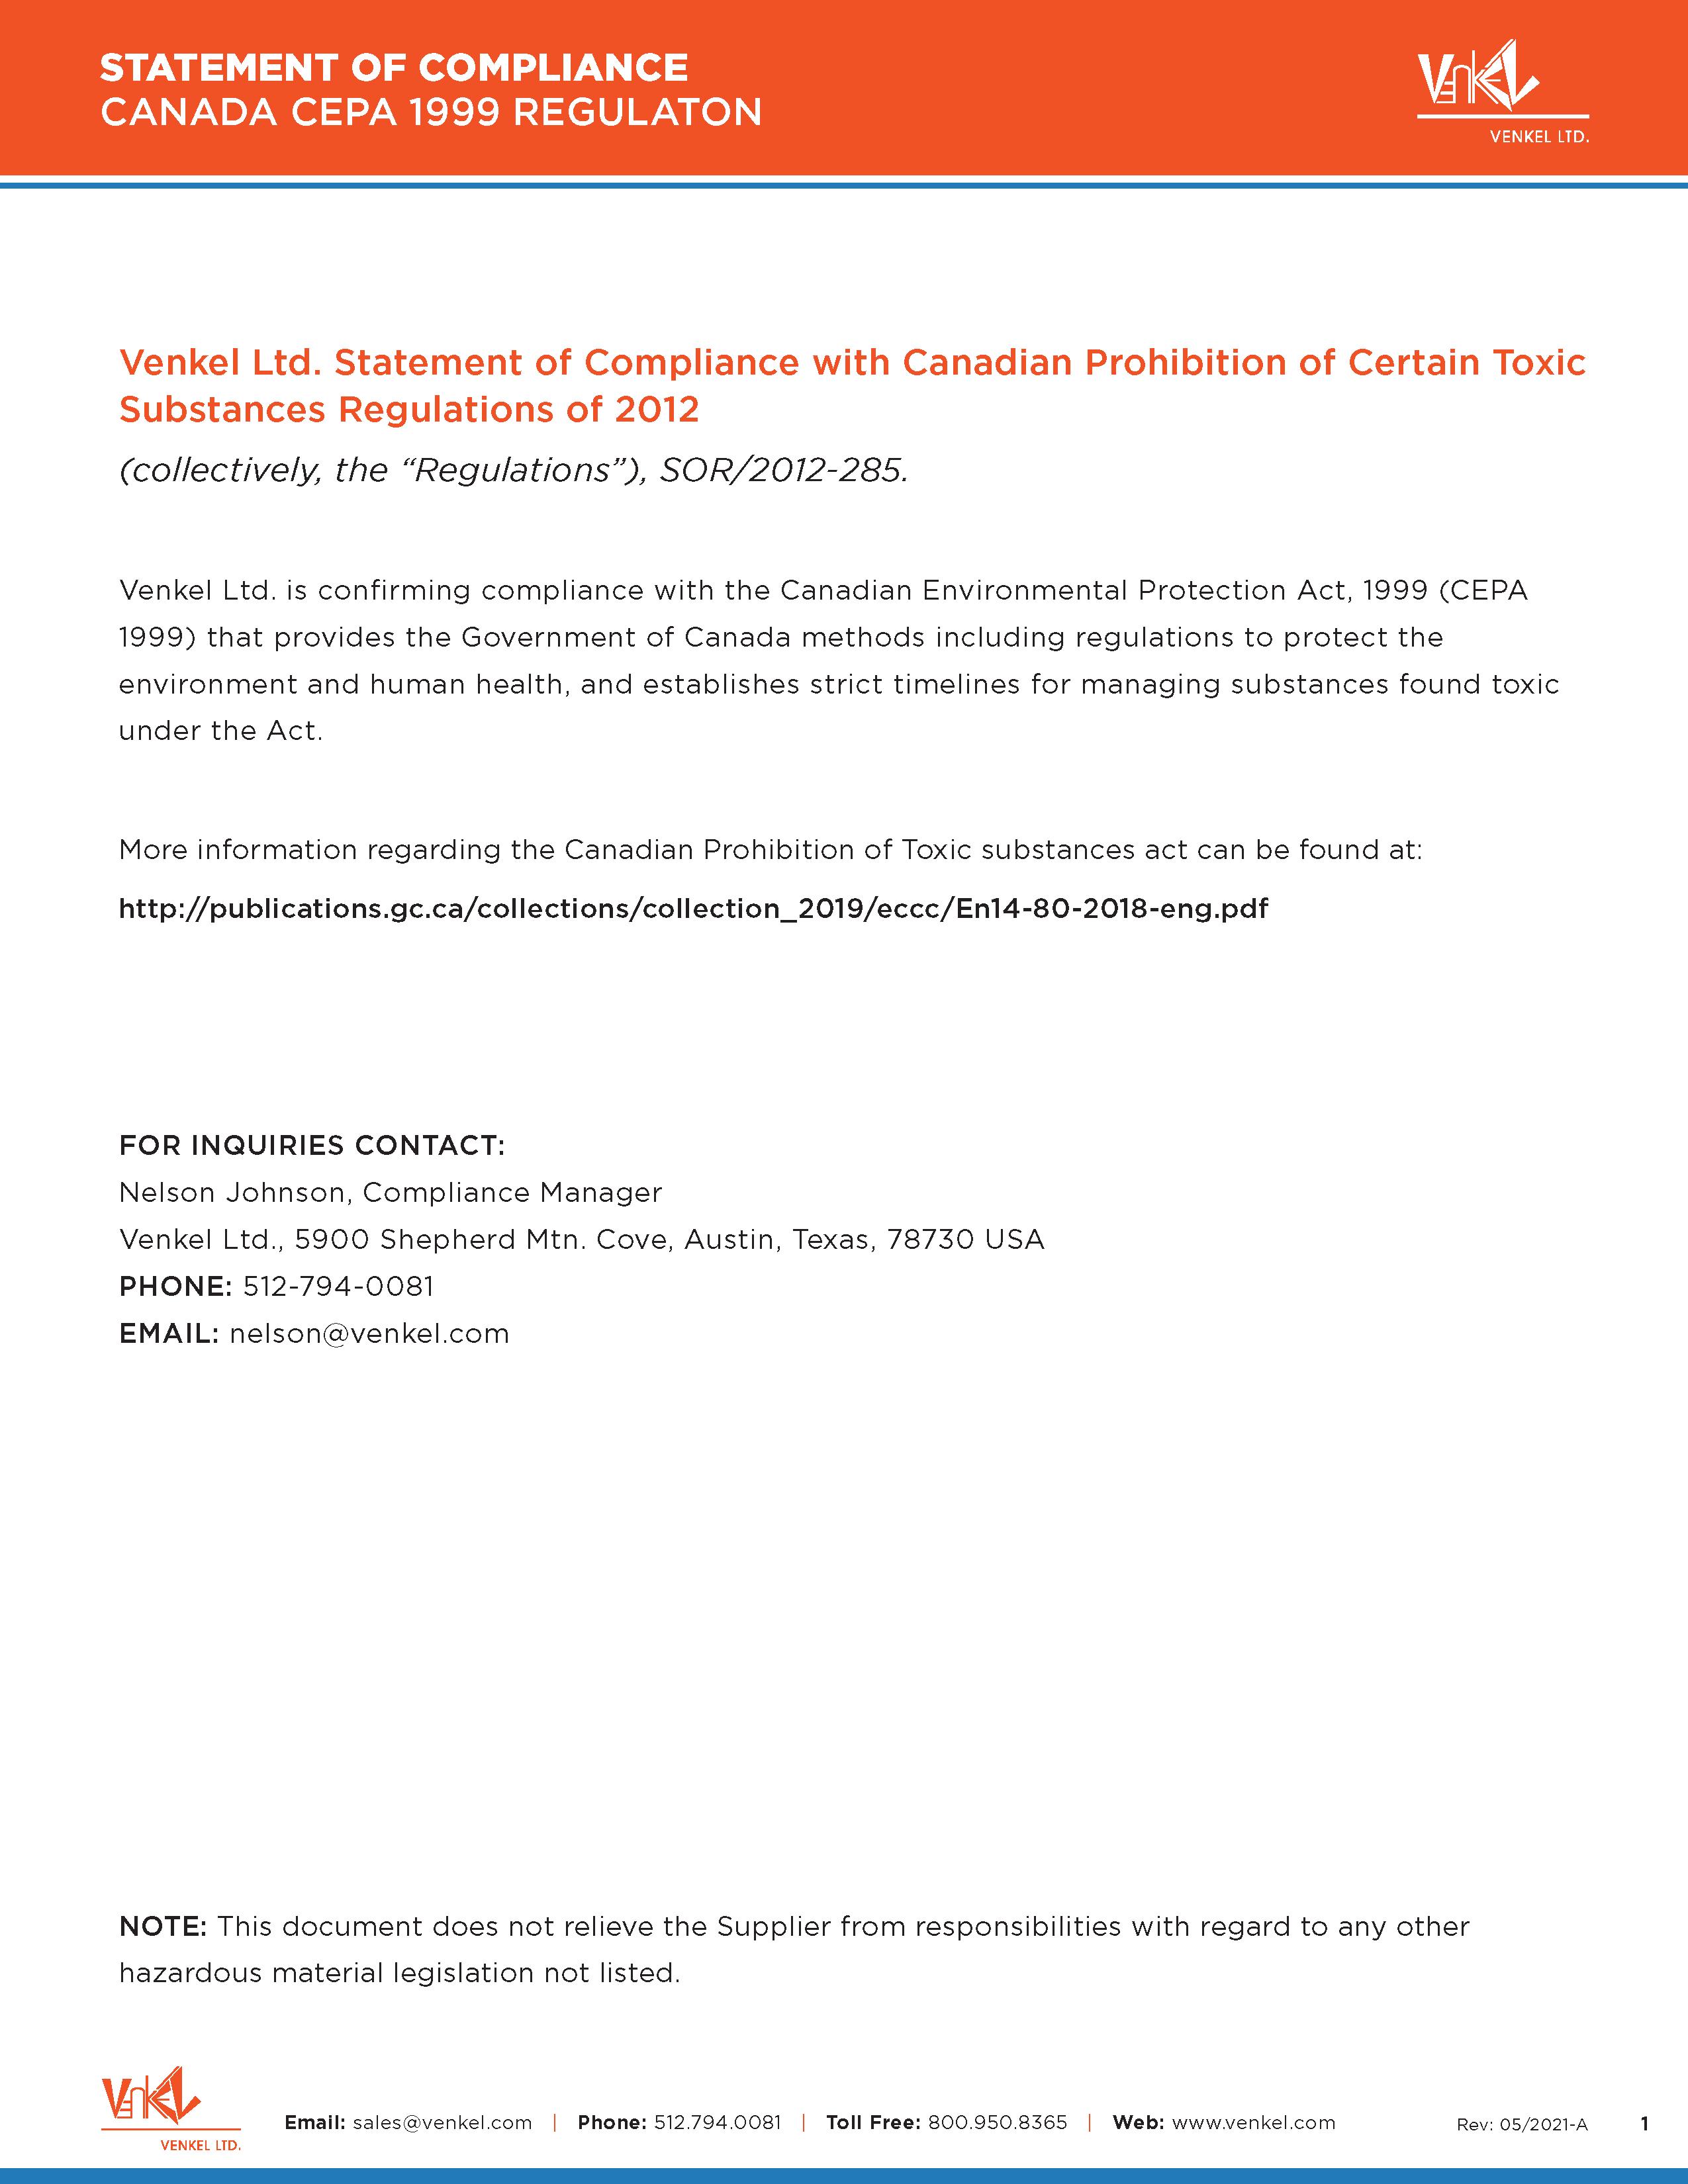 CEPA Statement